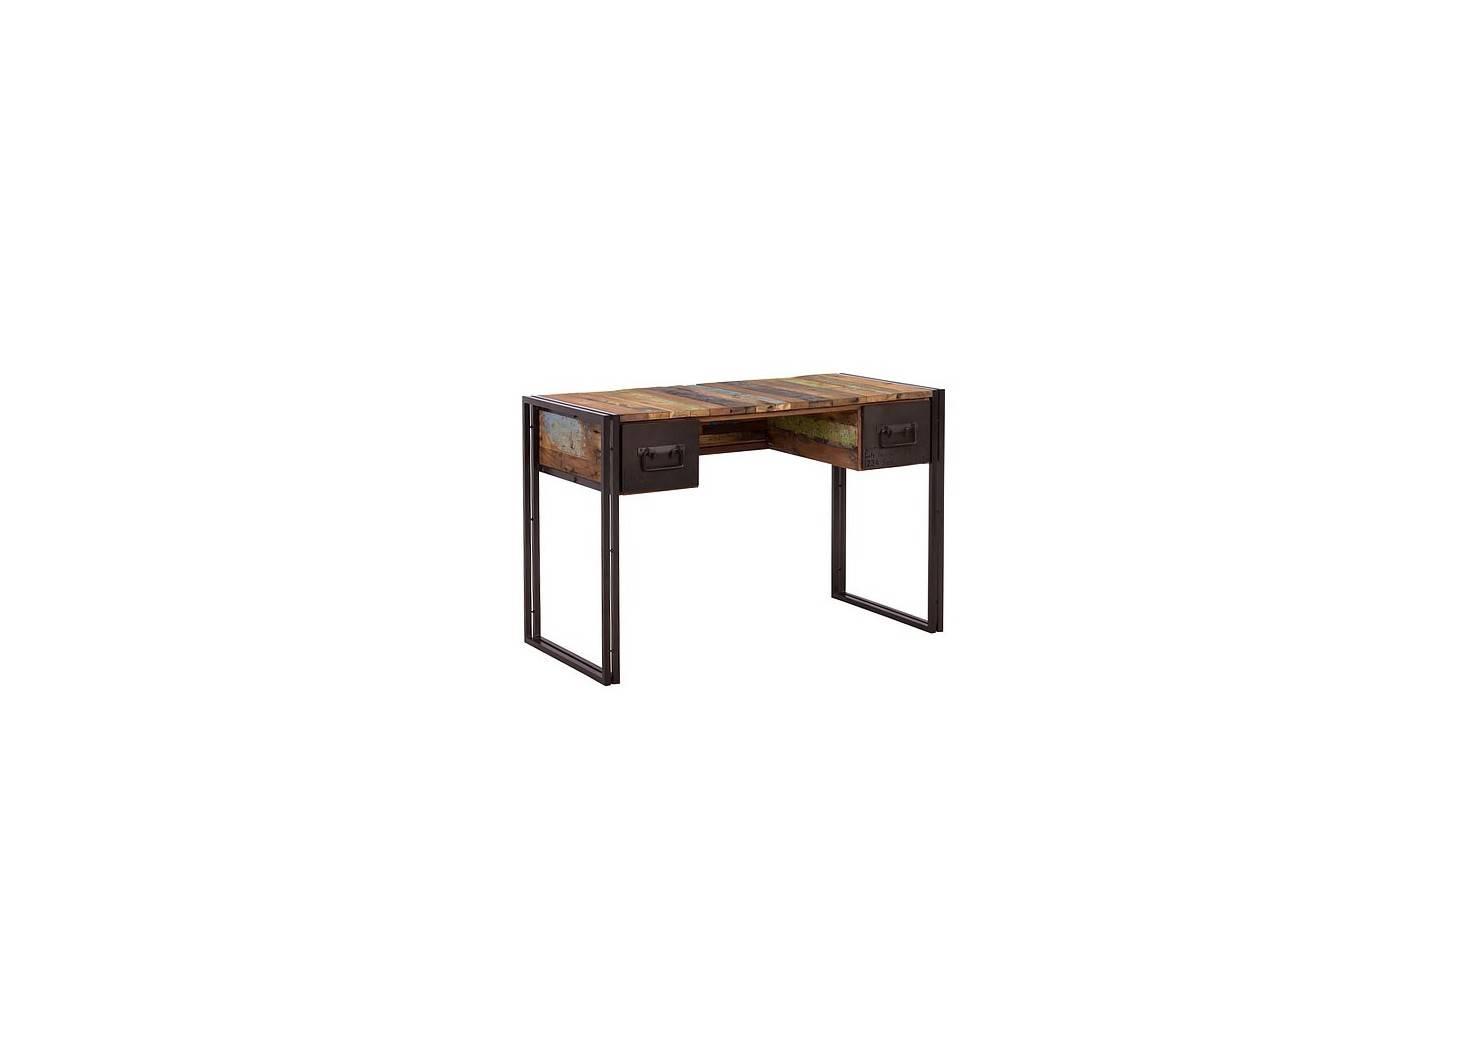 Bureau industriel Edito - 2 tiroirs